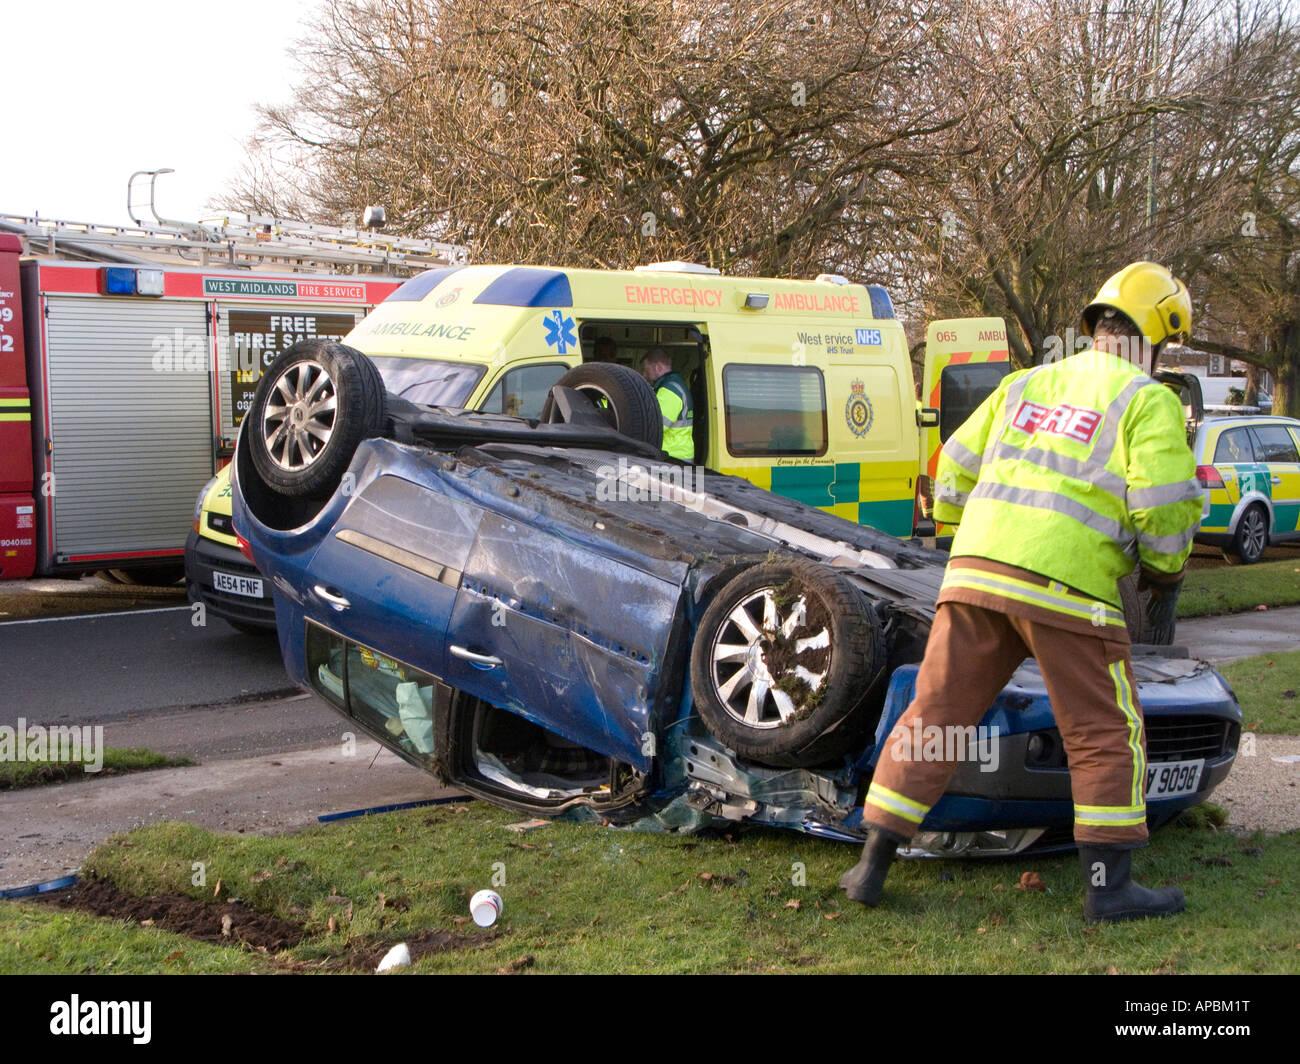 Fireman checks overturned car at road accident scene Stock Photo ...